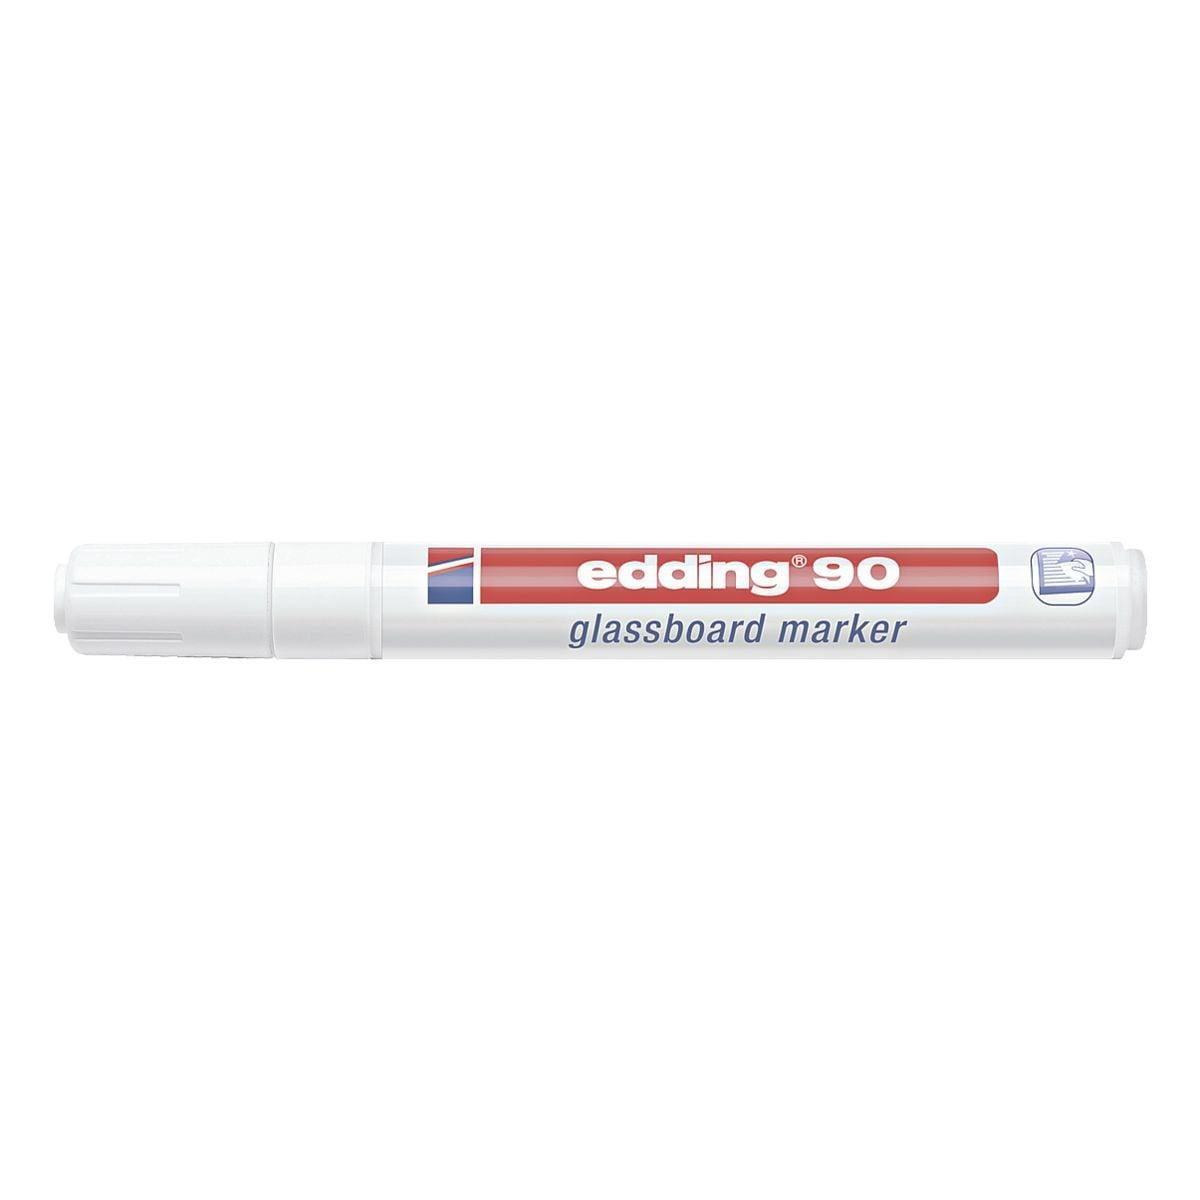 Edding Glasboard-Marker »e 90« weiß